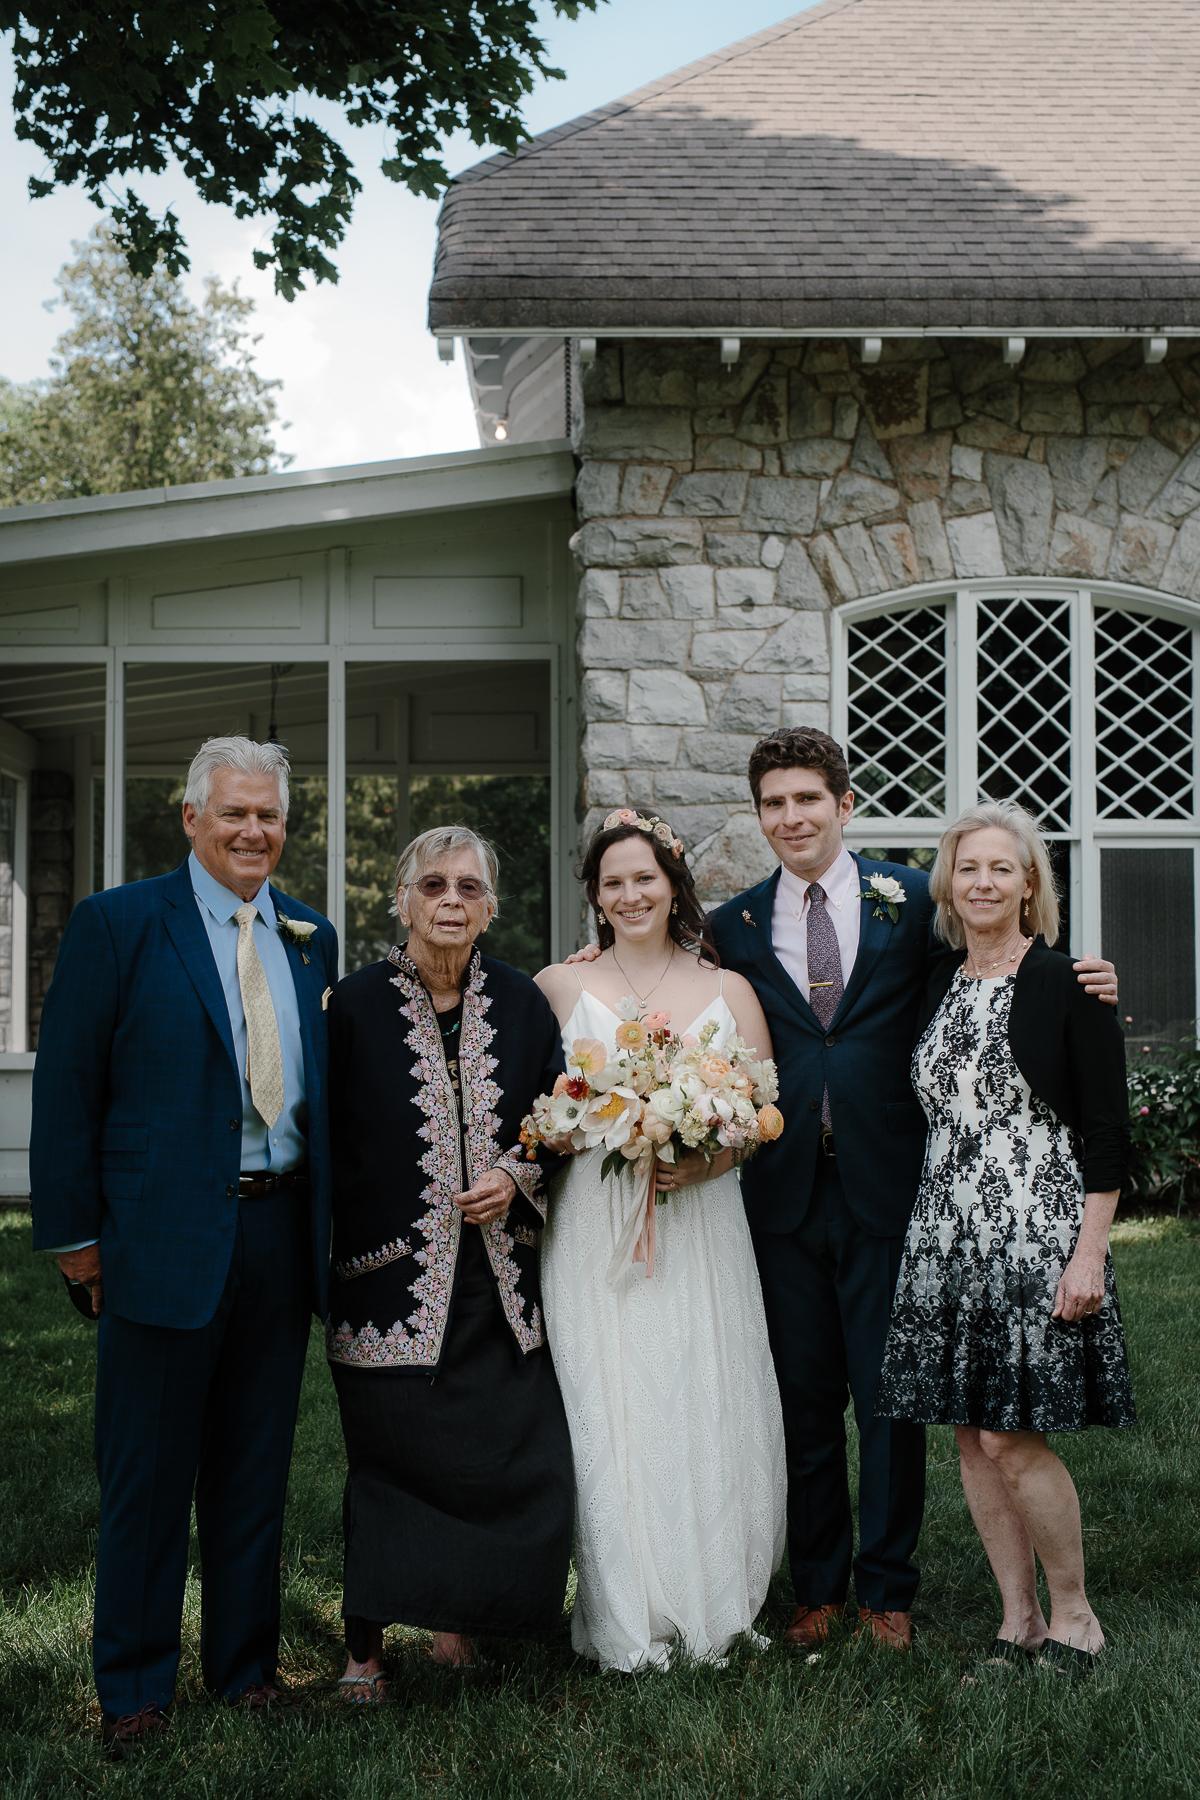 julia-nick-wedding-299.jpg